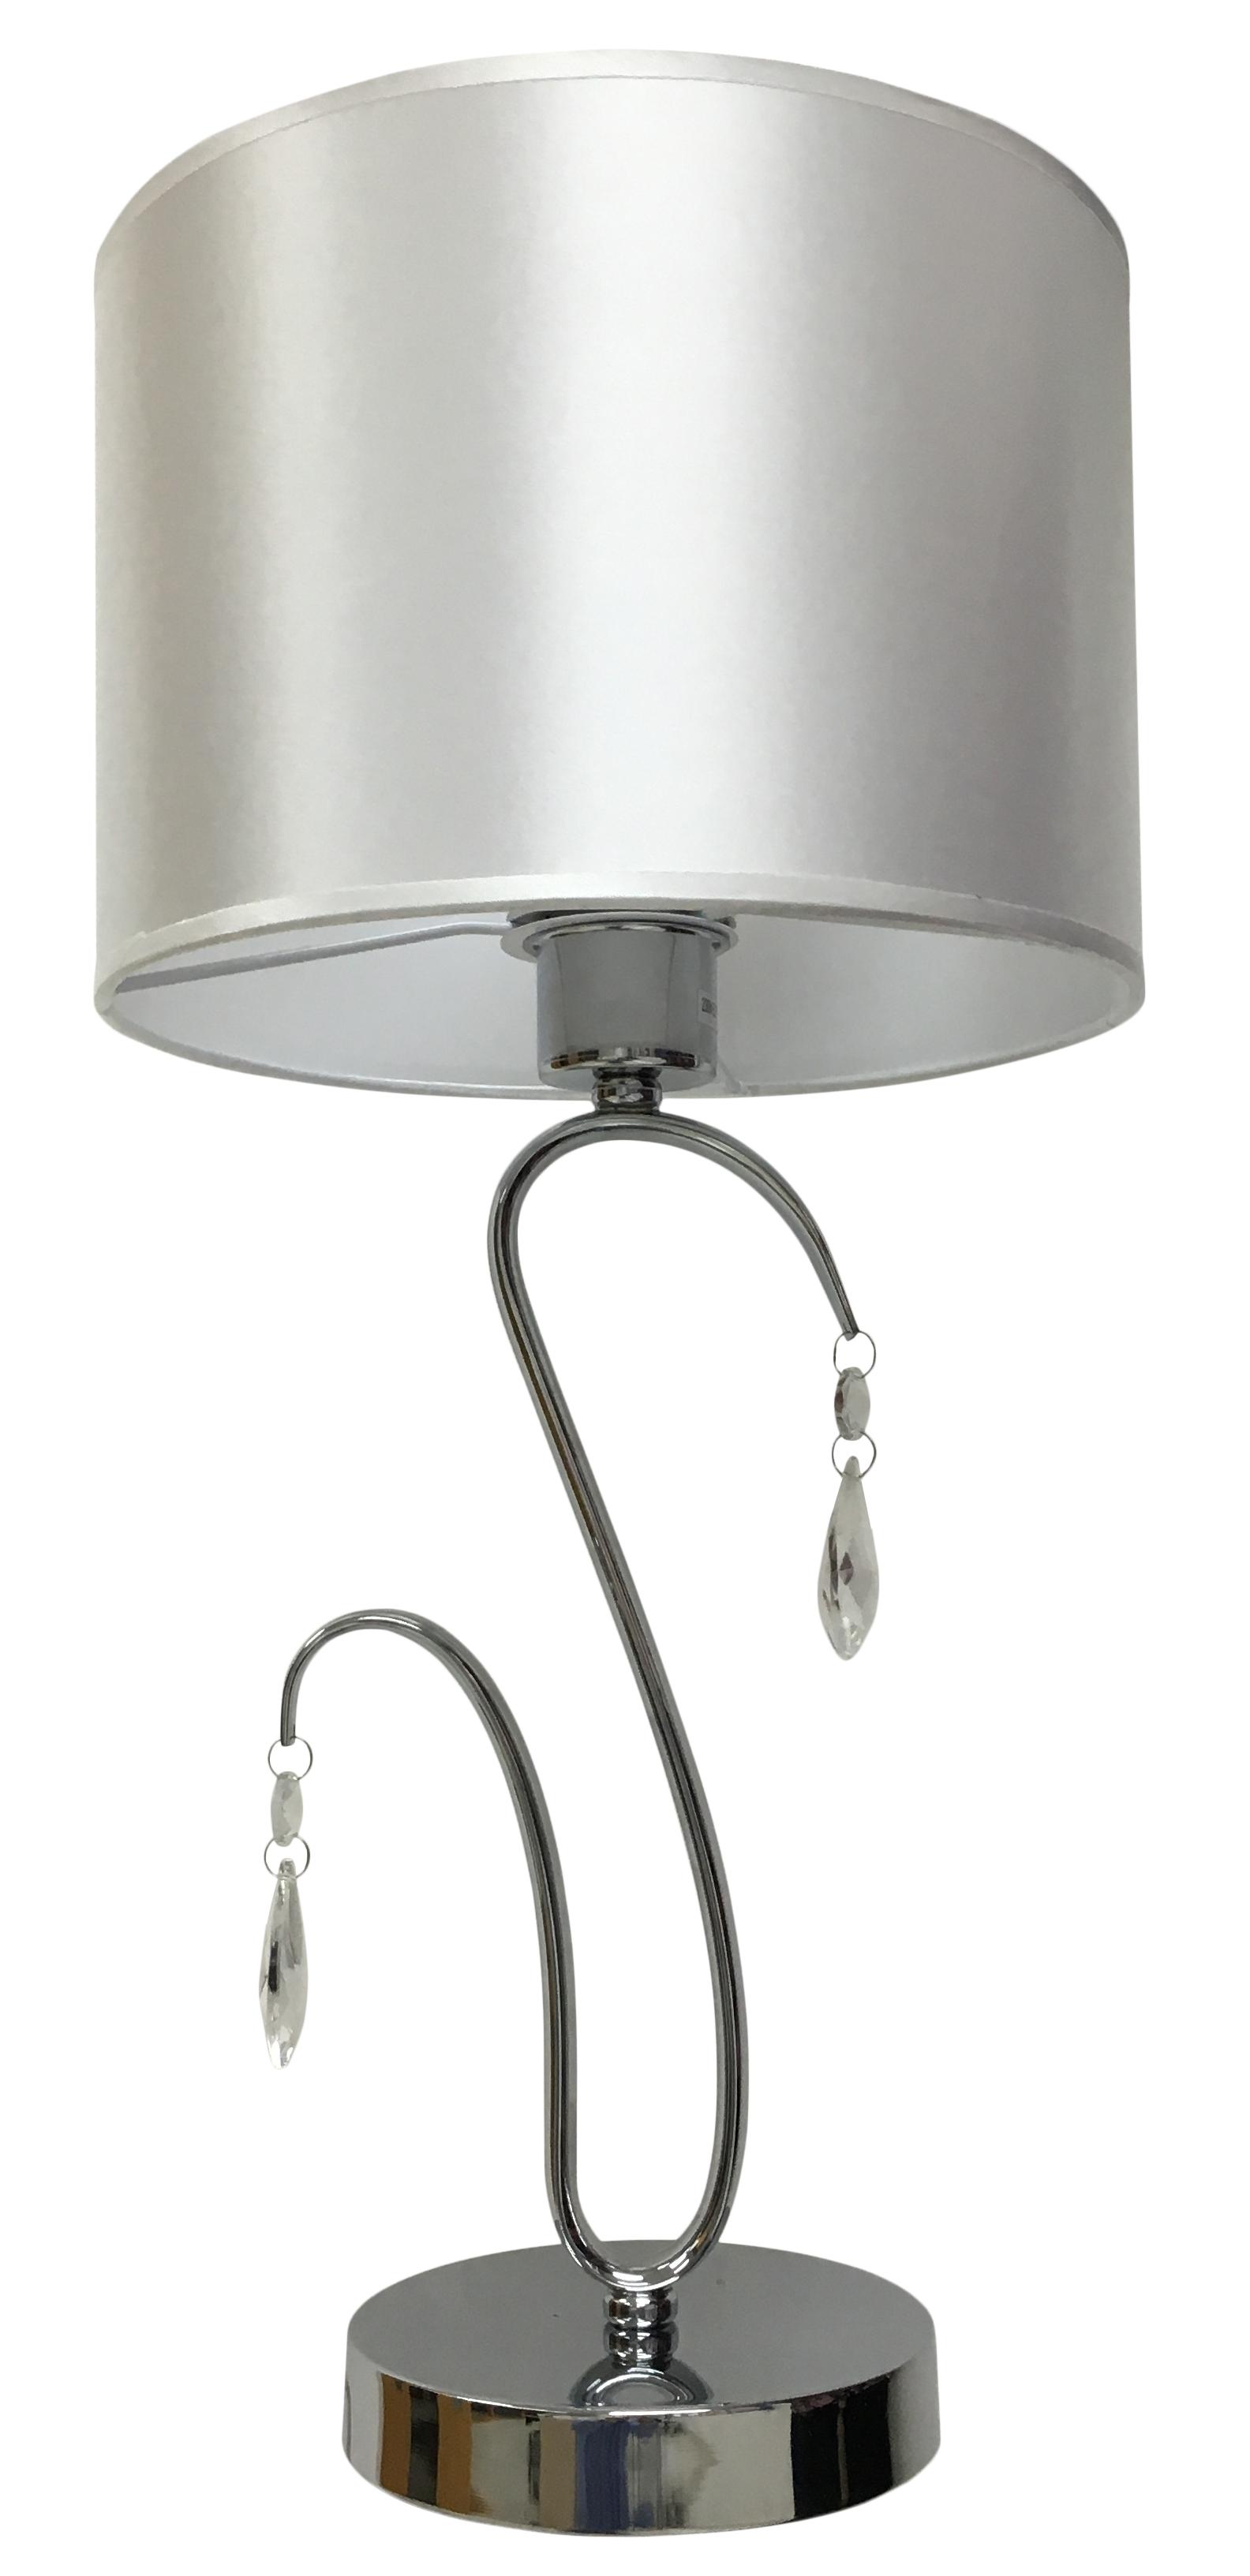 CARMEN LAMPA GABINETOWA 1X60W E27 CHROM - 41-40602